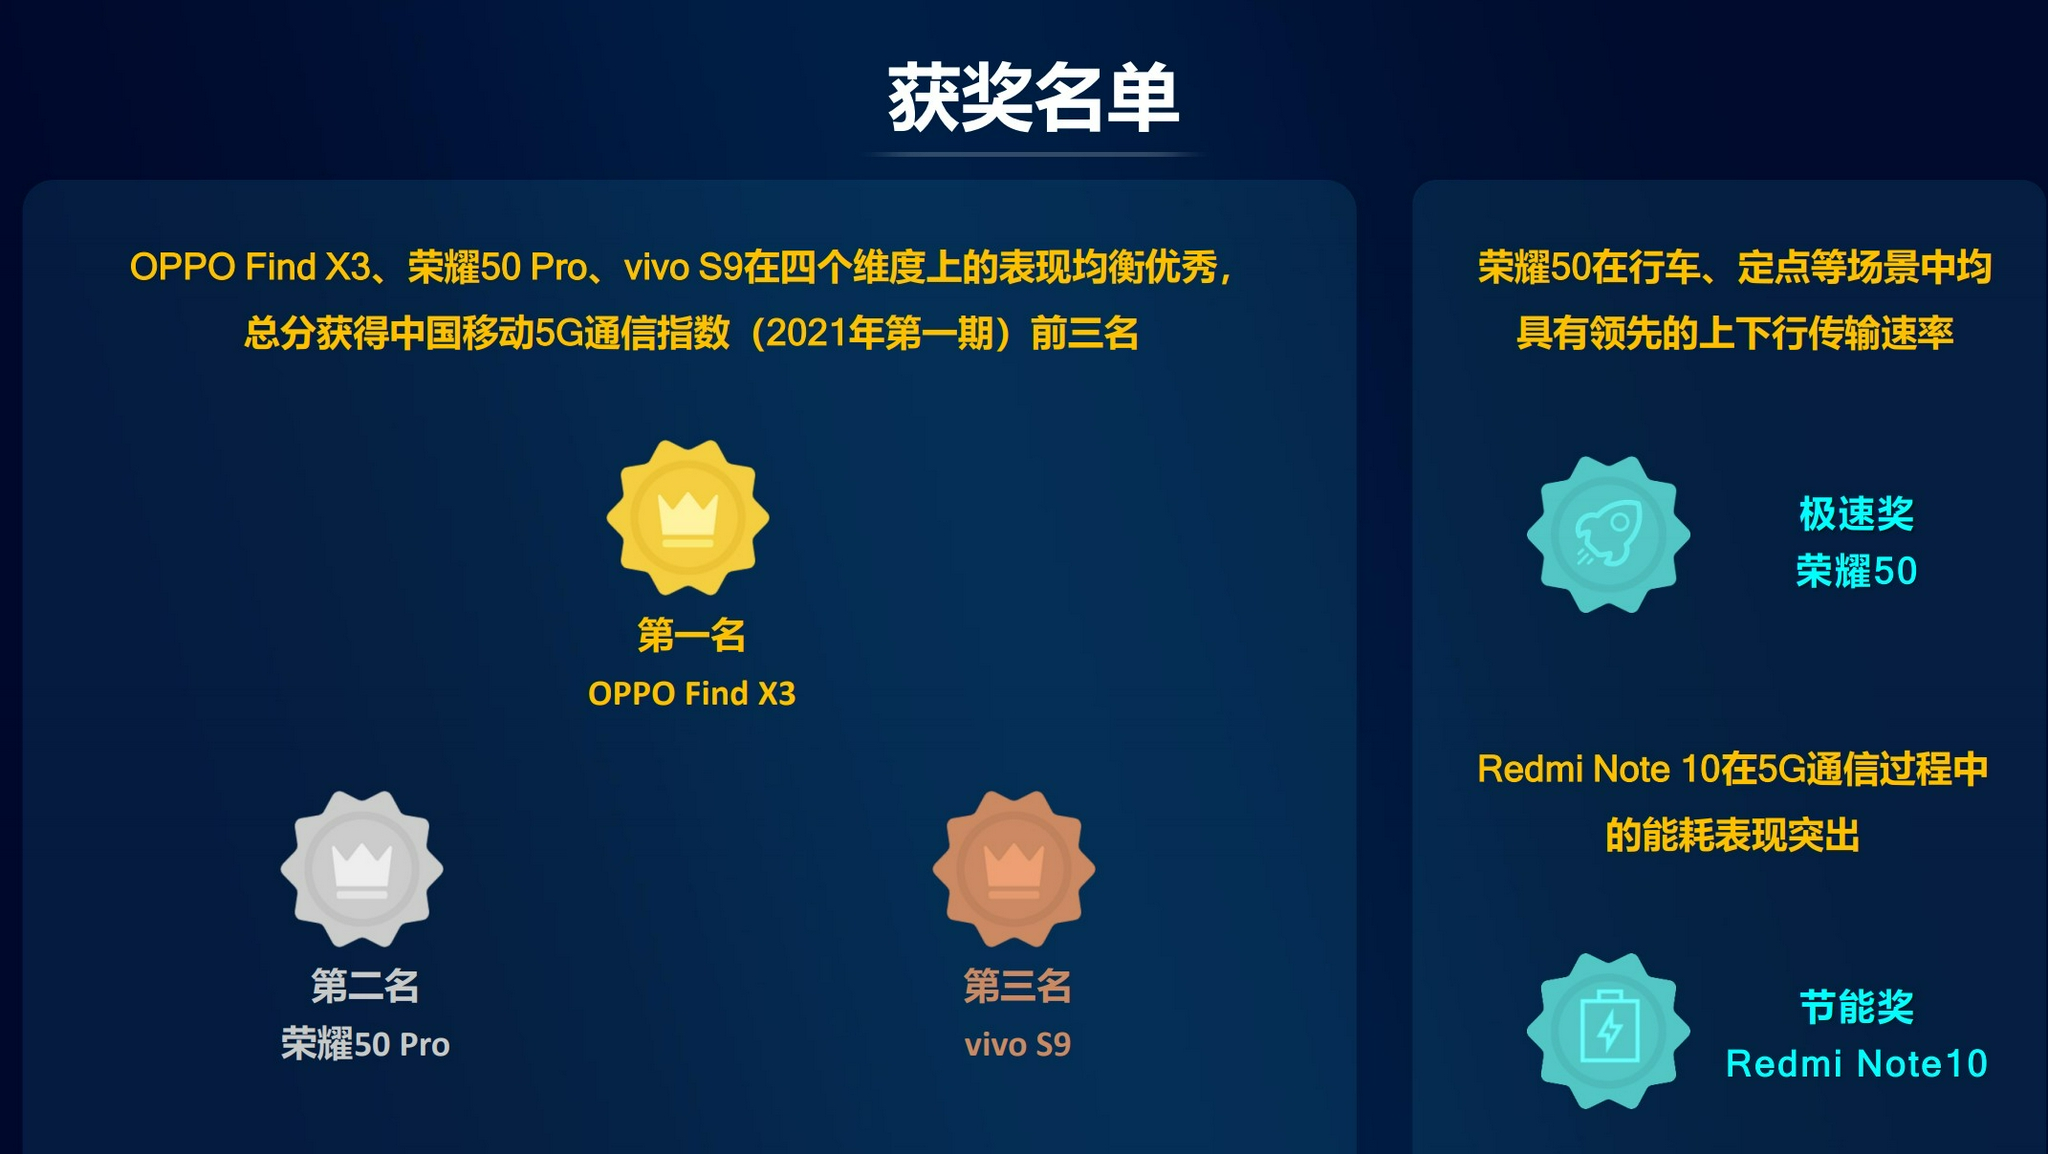 5G手机最权威评测来了!《中国移动5G通信指数报告》正式发布